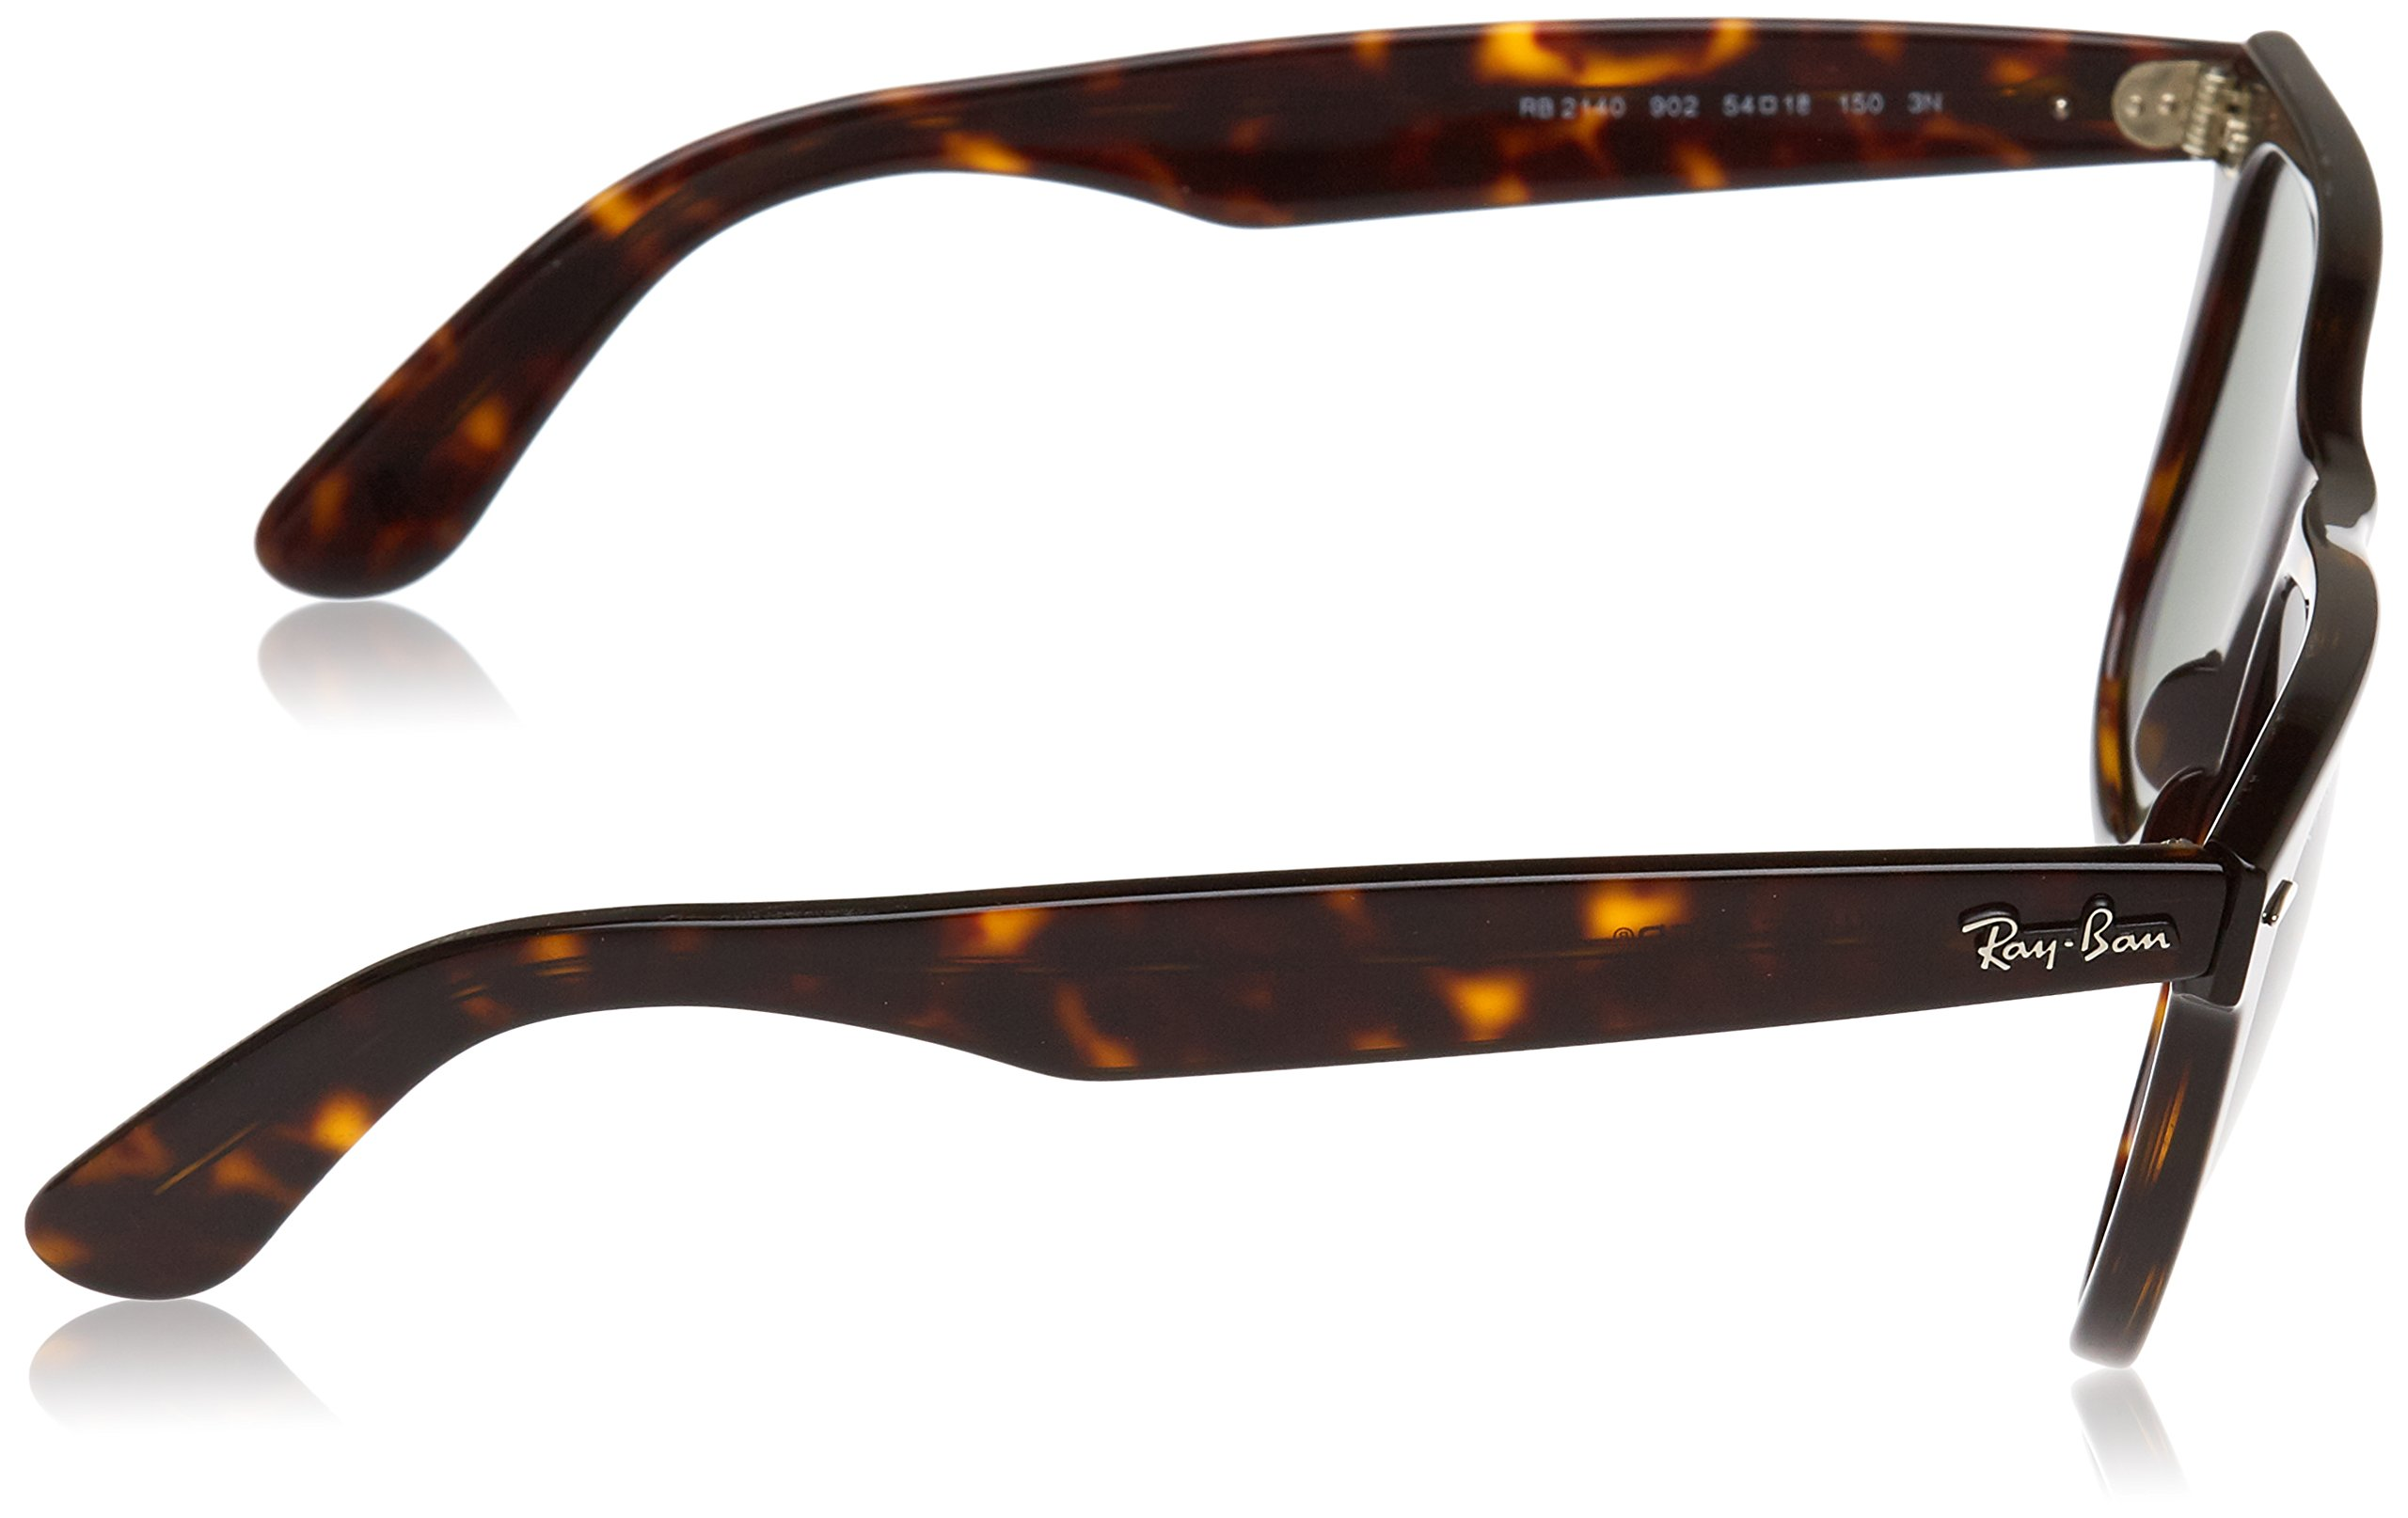 Ray-Ban, RB2140 Original Wayfarer Sunglasses, Unisex Ray-Ban Glasses, 100% UV Protection, Non-Polarized, Reduce Eye Strain, Lightweight Acetate Frame, Prescription-Ready Lenses, 54 mm Frame by Ray-Ban (Image #3)